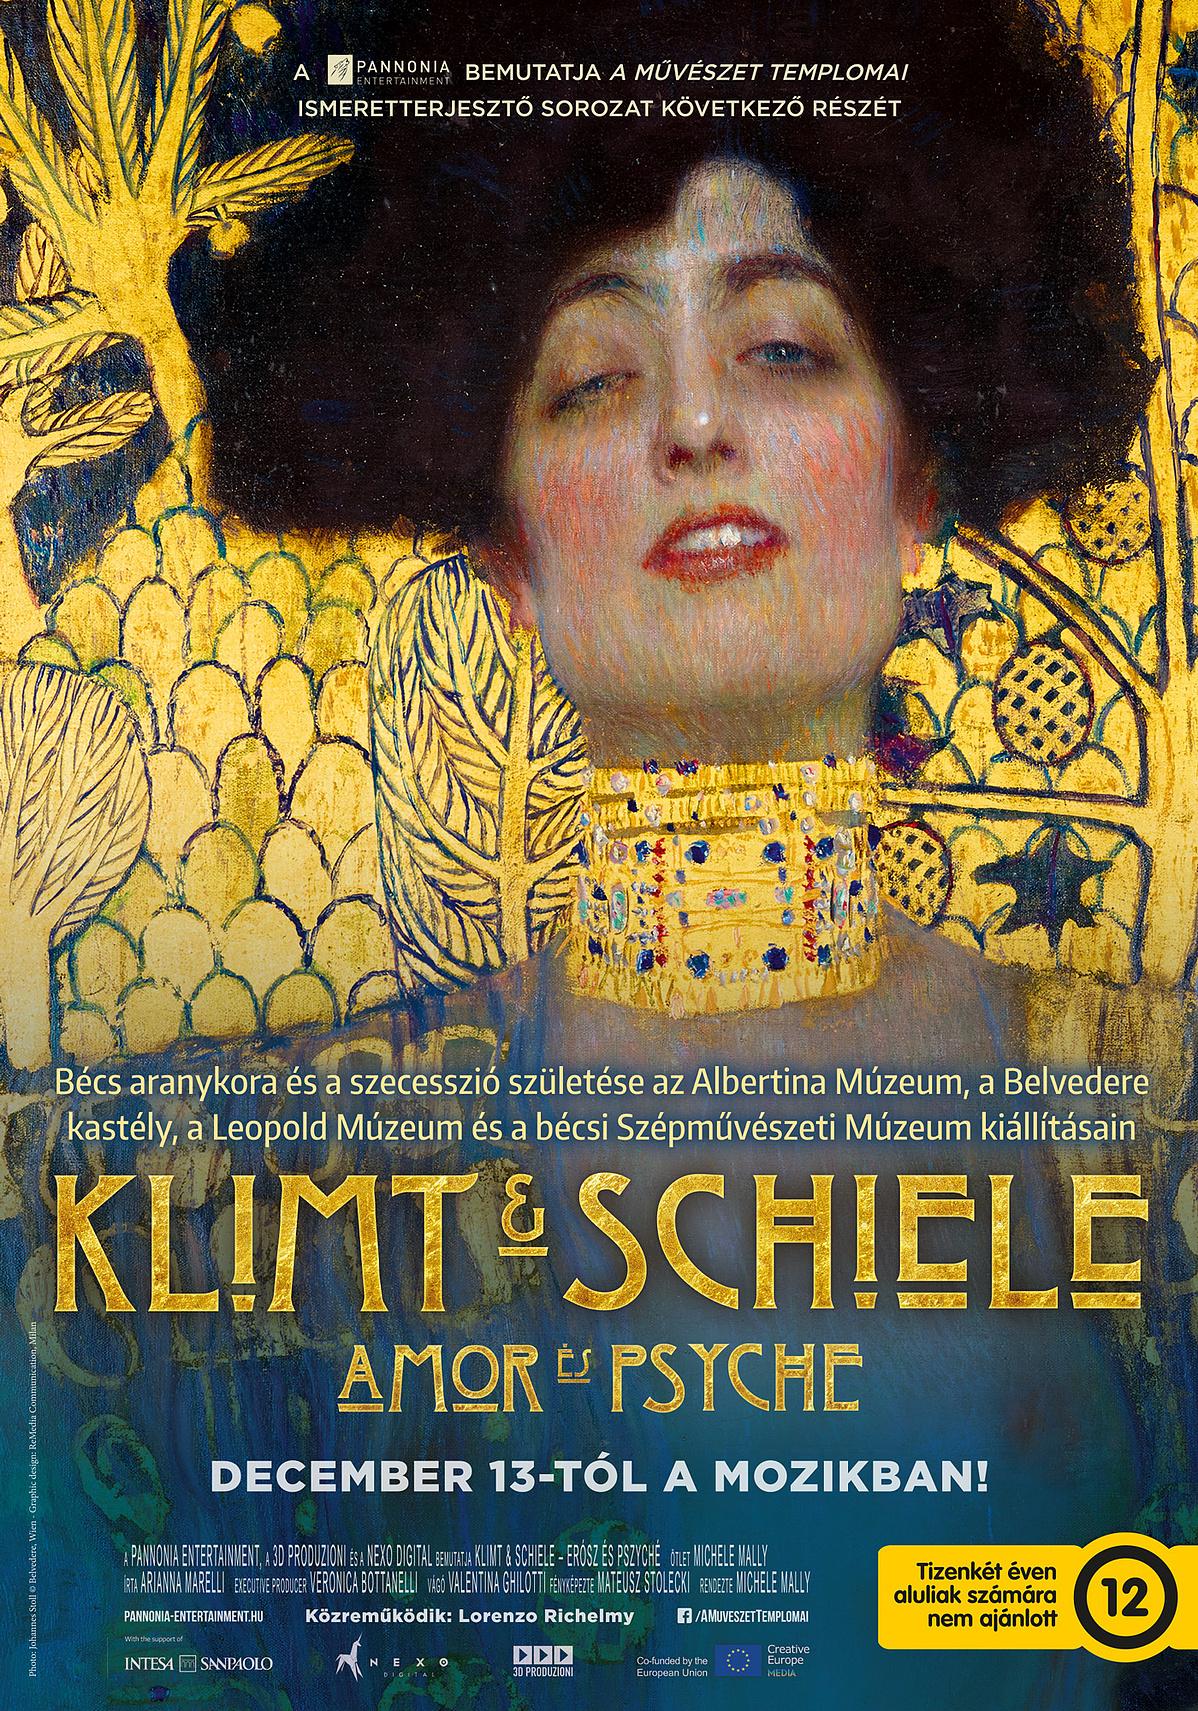 klimt_schiele_B1_HUN_poster-WEB-103527.jpg